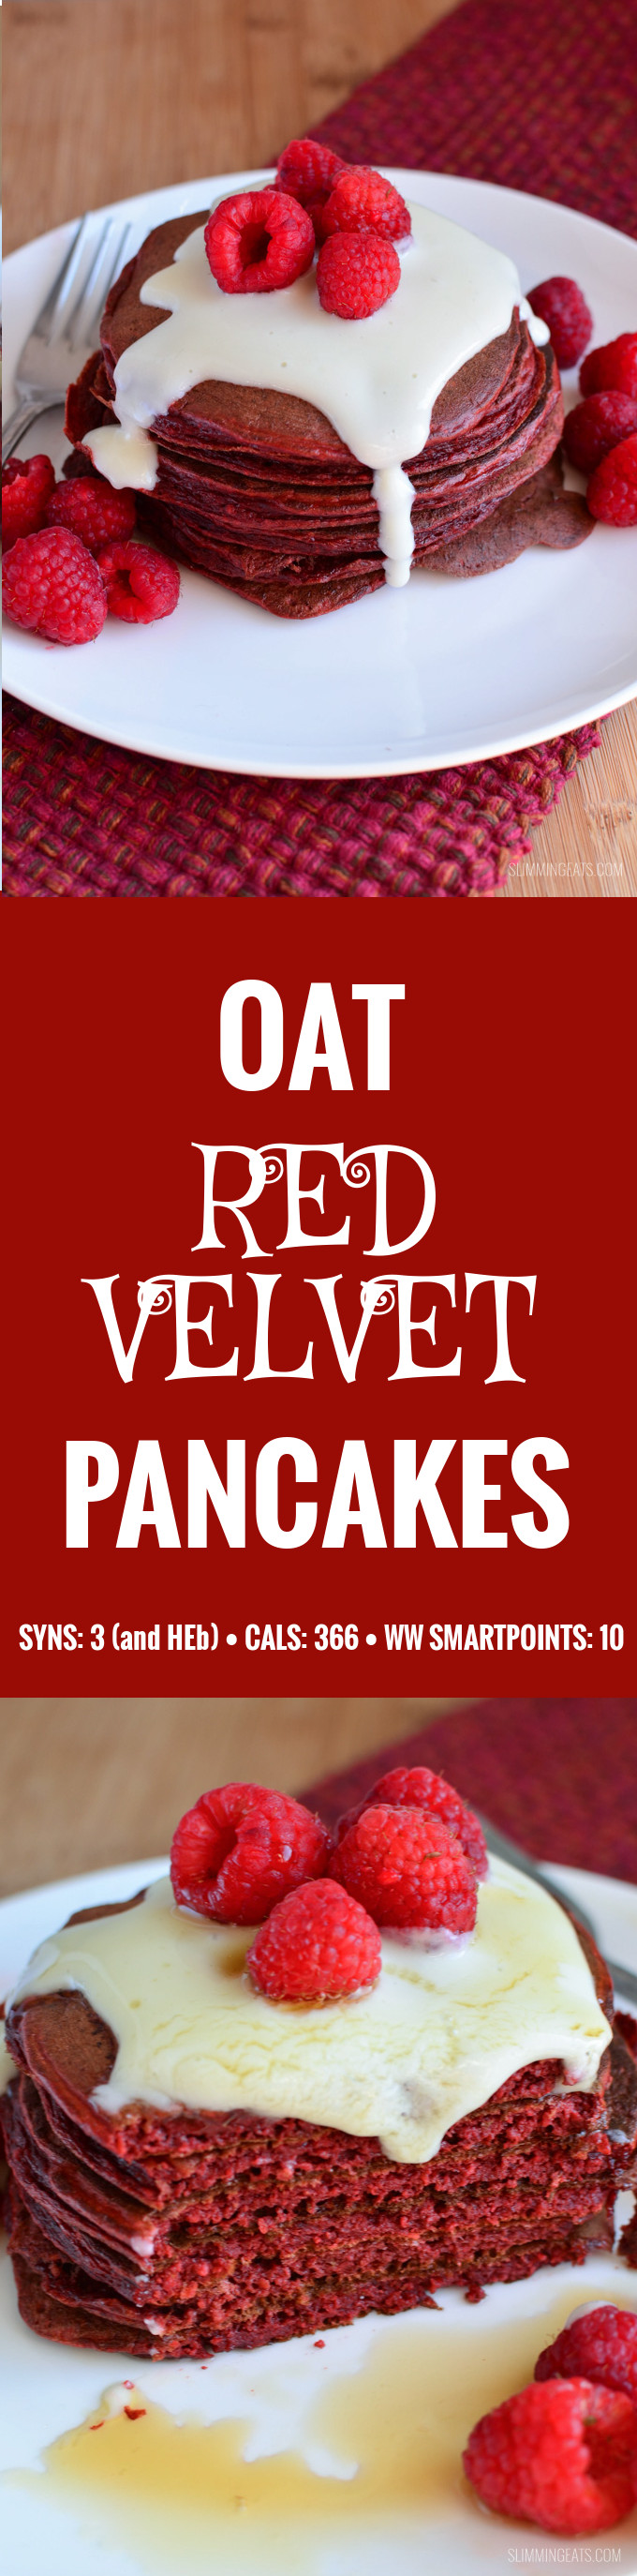 Slimming Eats Red Velvet Pancakes - gluten free, vegetarian, Slimming World and Weight Watchers friendly